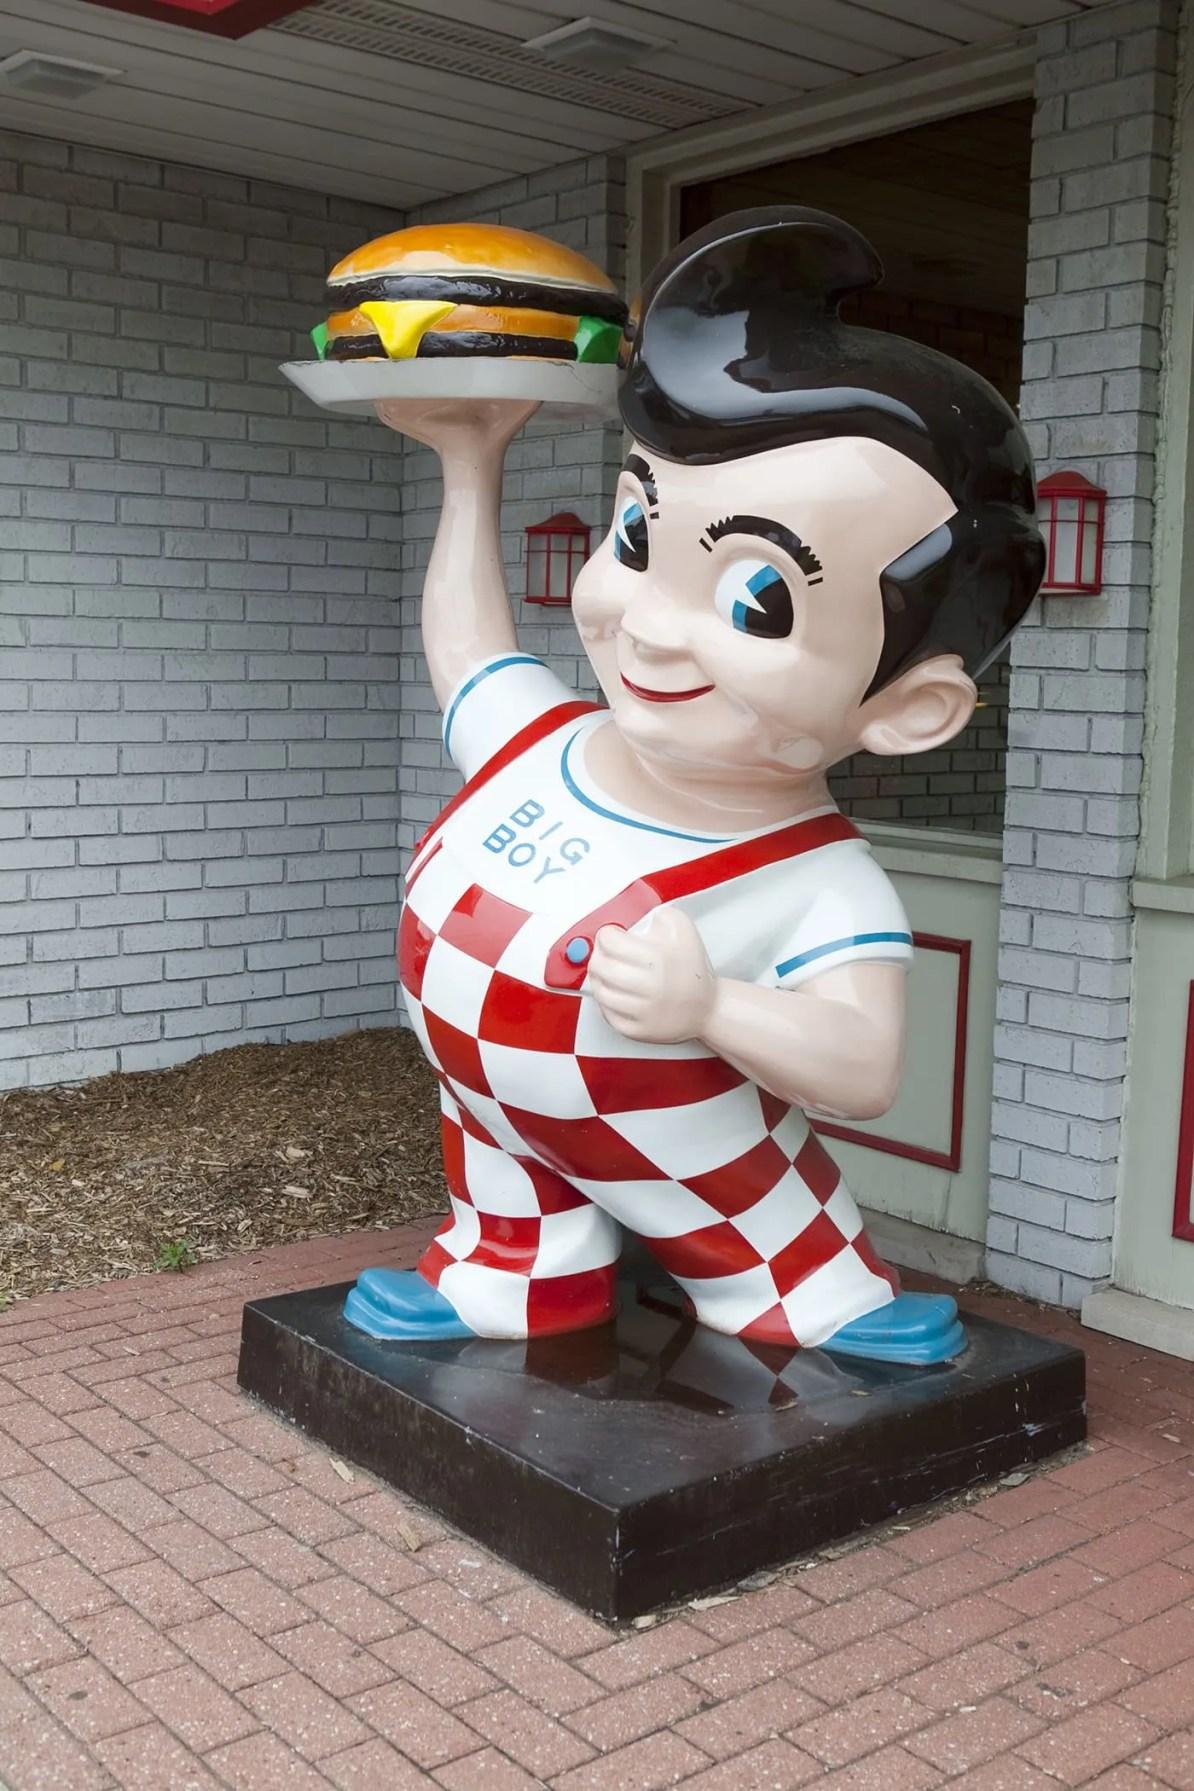 Big Boy Statue - I-94 Exit 23 in Michigan